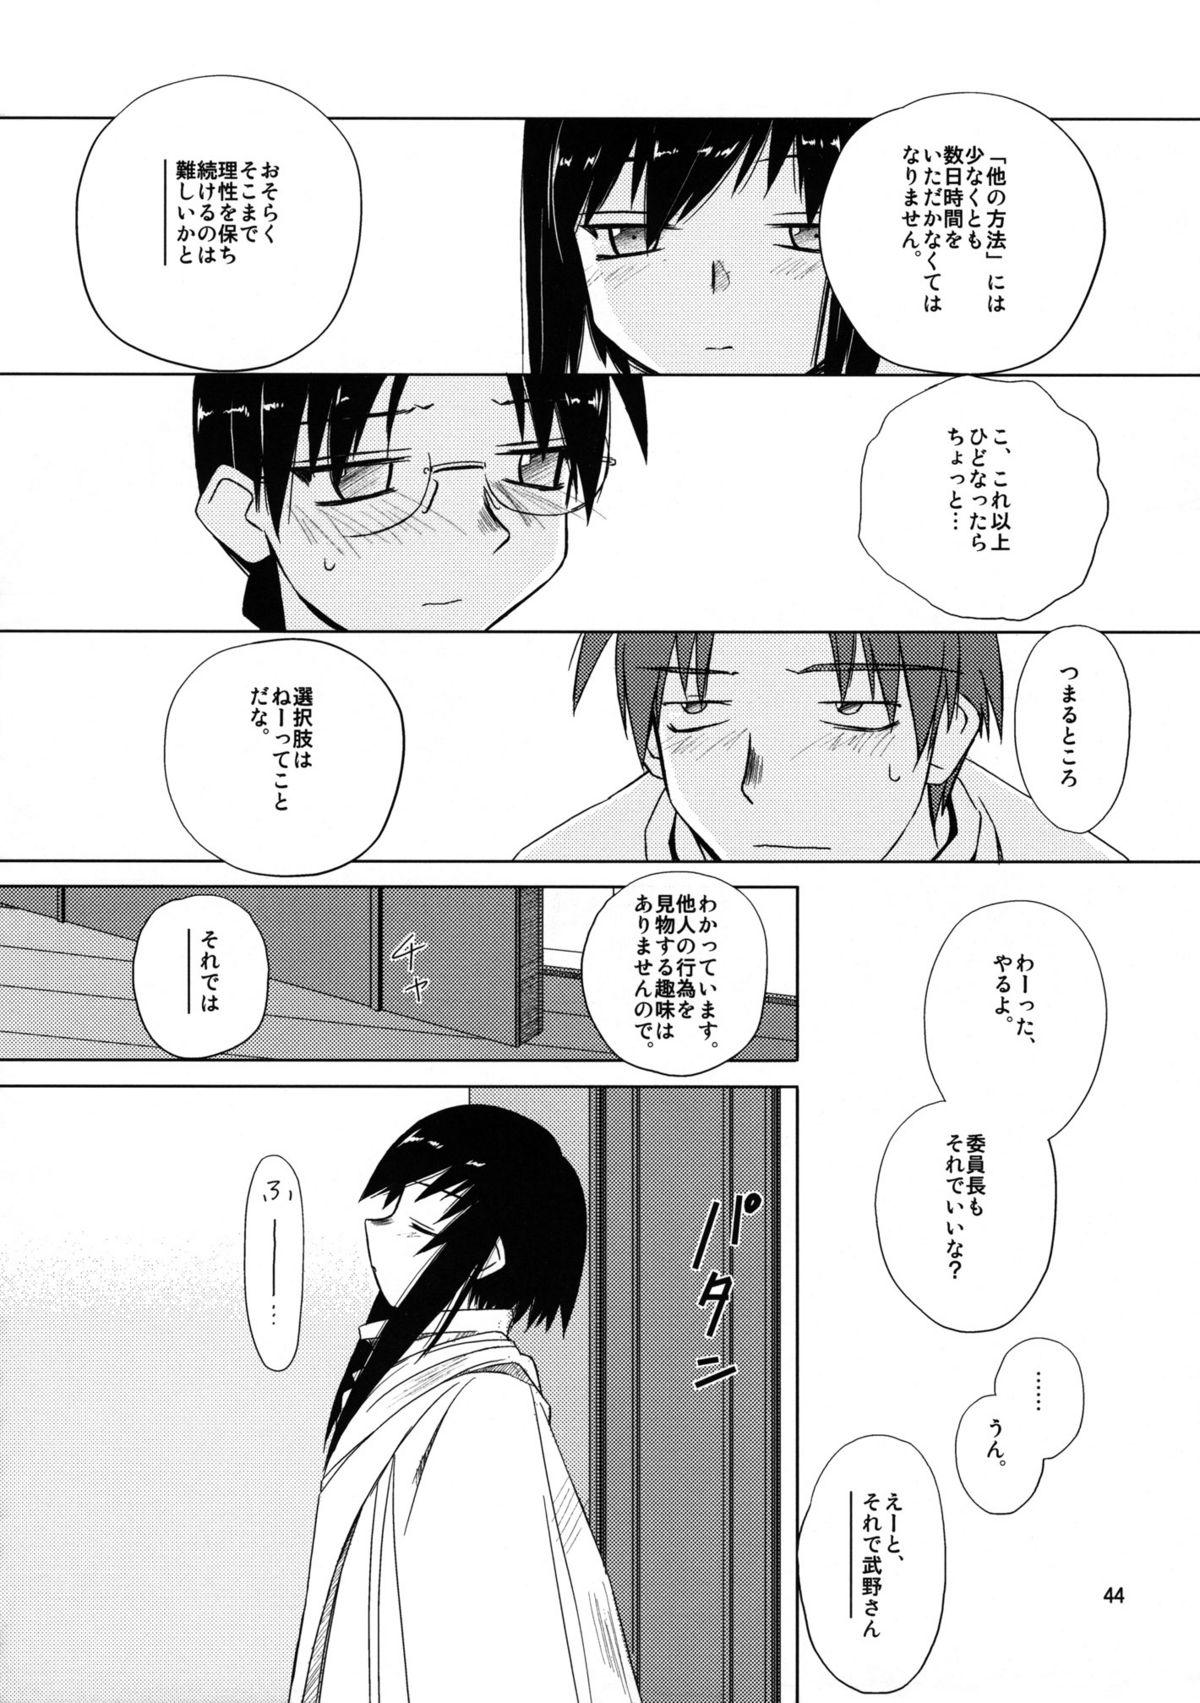 (C68) [Tear Drop (tsuina)] [C2] (To Heart) 44